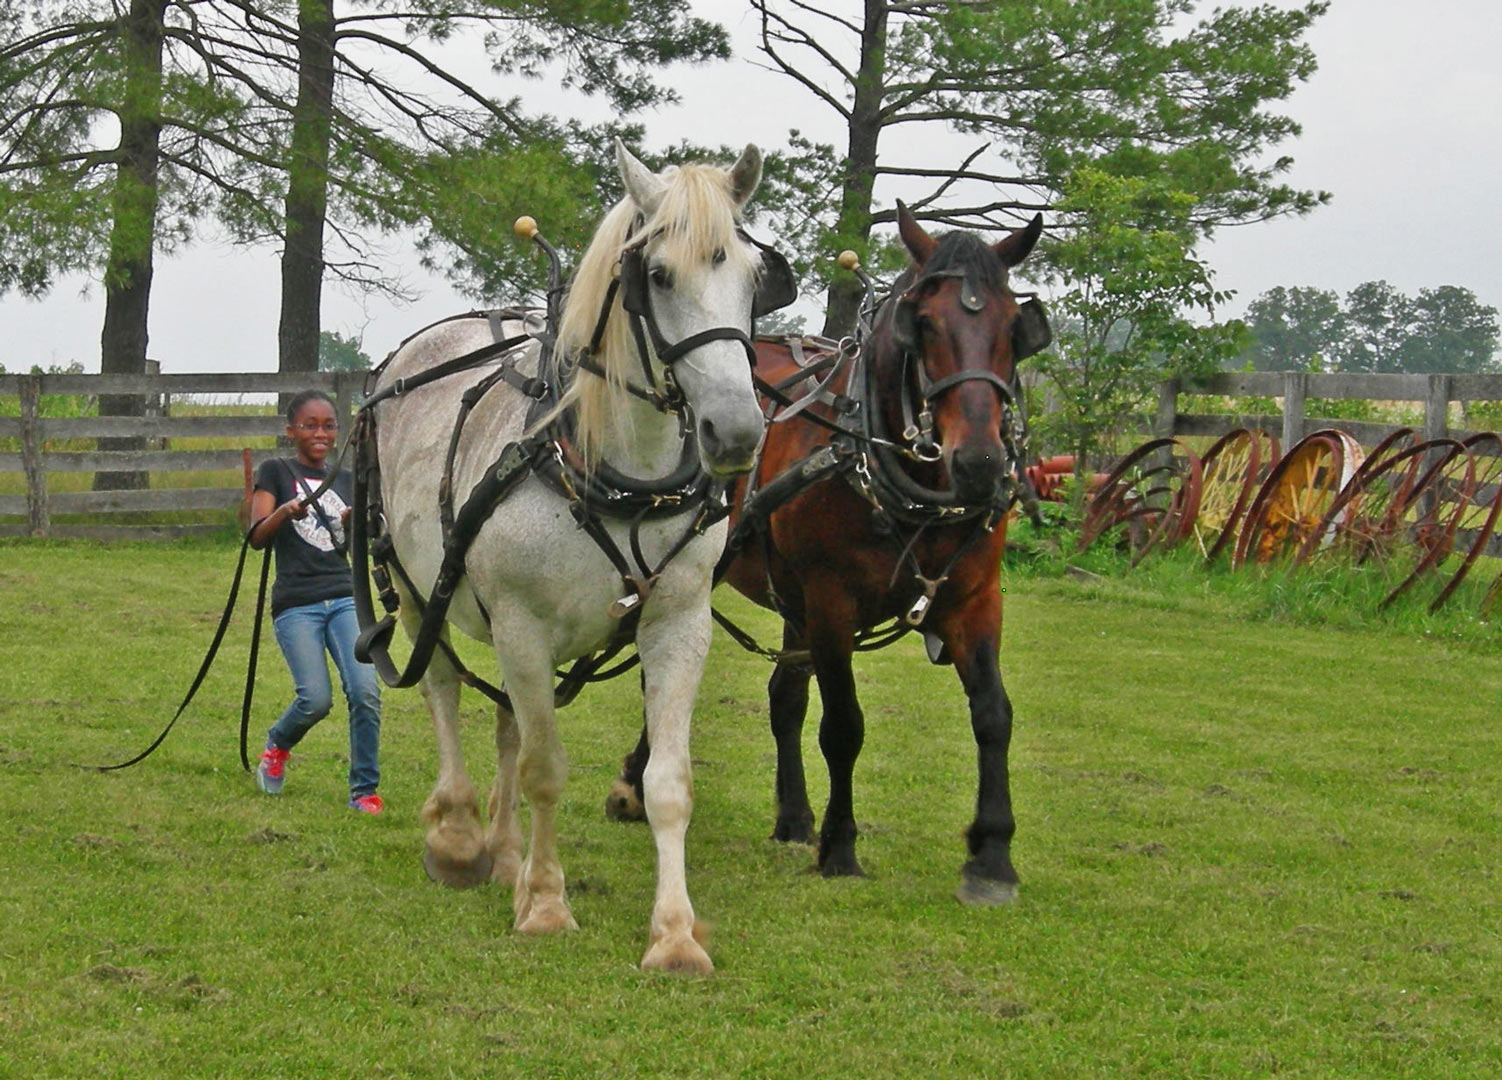 Girl drives Percheron horses on education class at Slate Run Farm